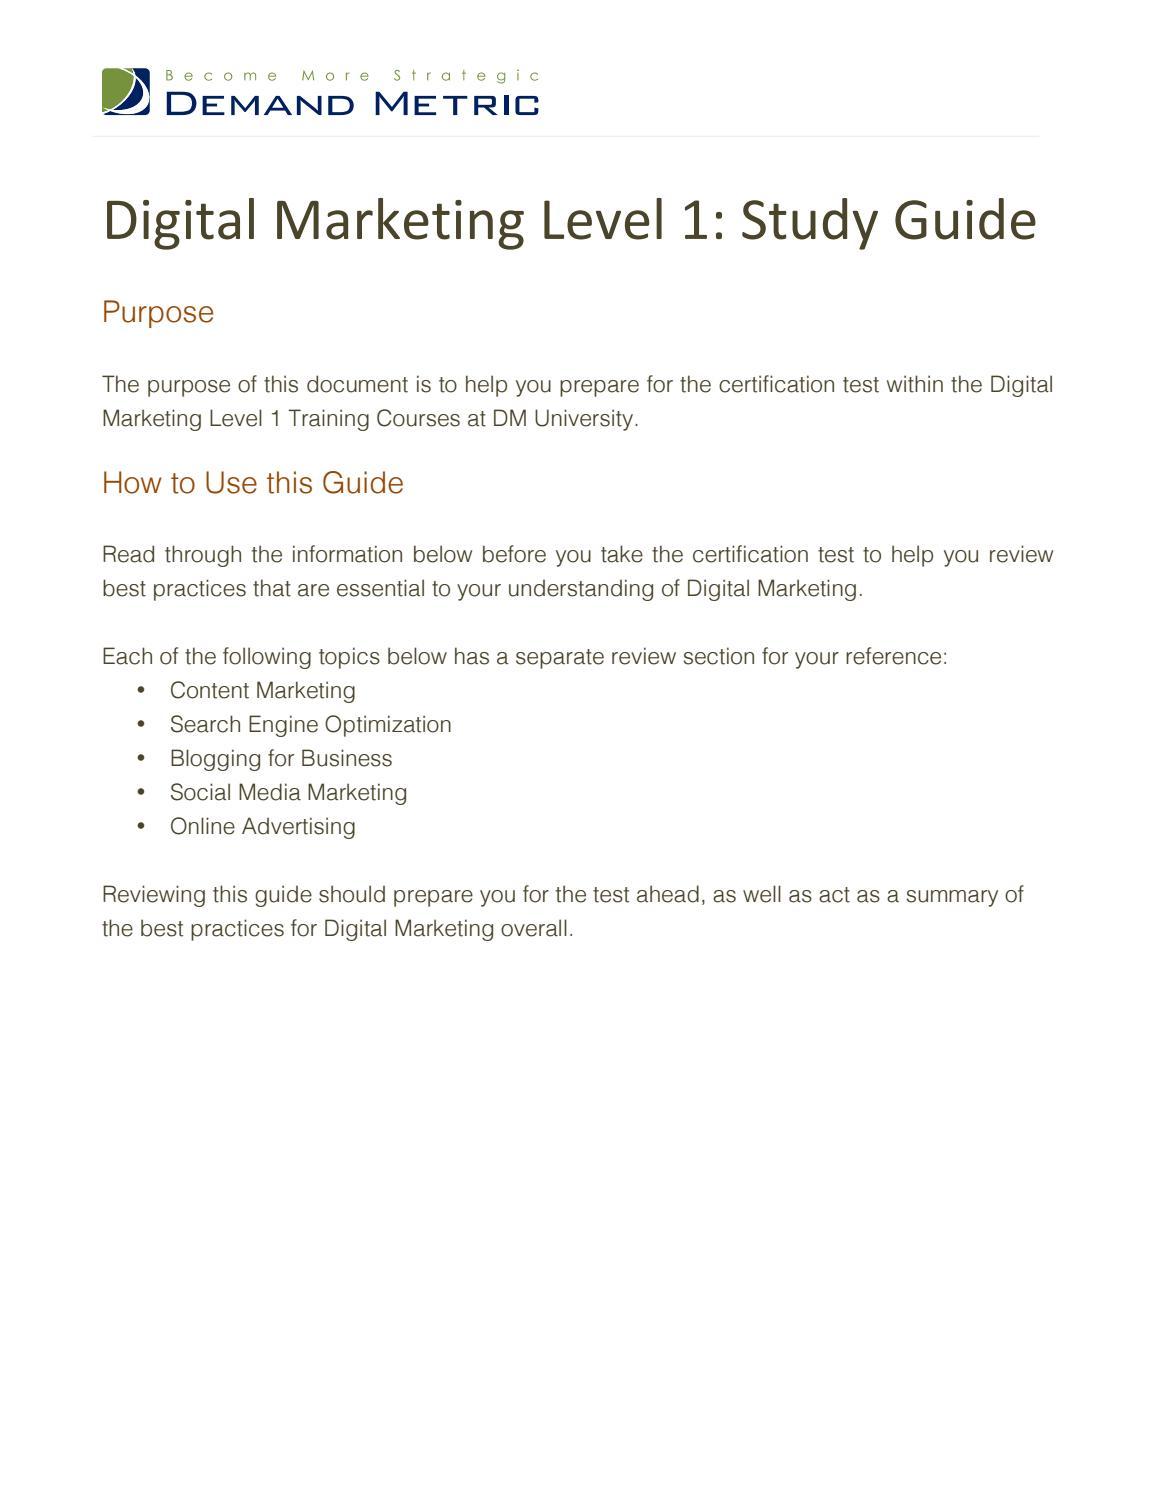 Digital marketing certification test study guide level 1 by pahmi digital marketing certification test study guide level 1 by pahmi ritonga issuu xflitez Choice Image